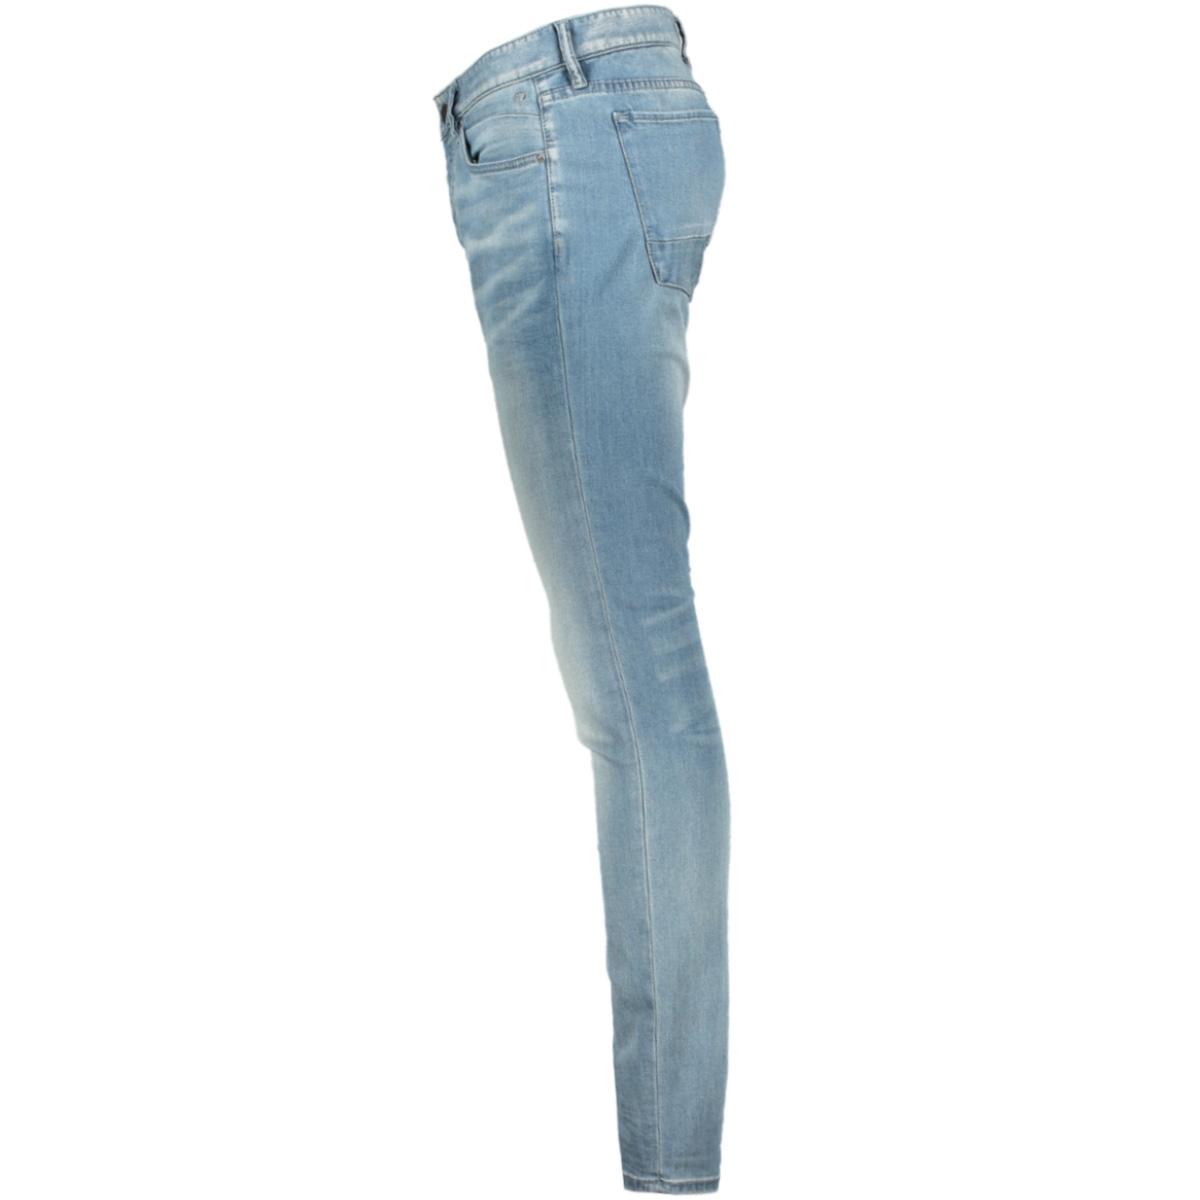 riser slim summer greencast ctr201222 cast iron jeans sug